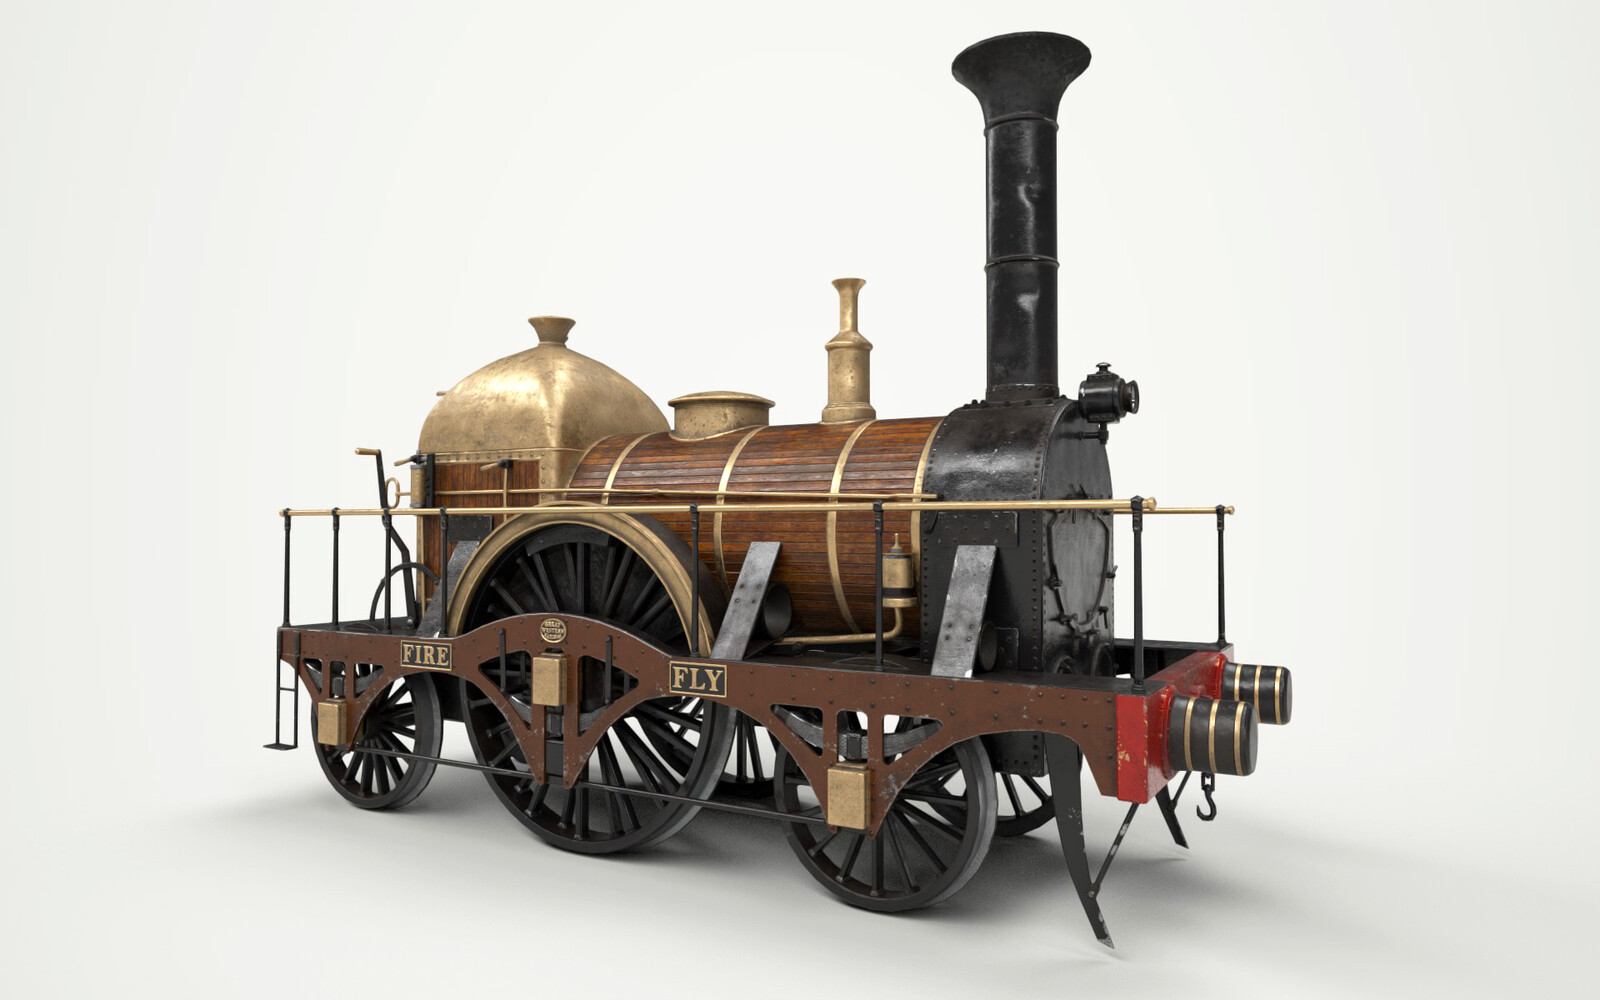 Firefly (historical train)